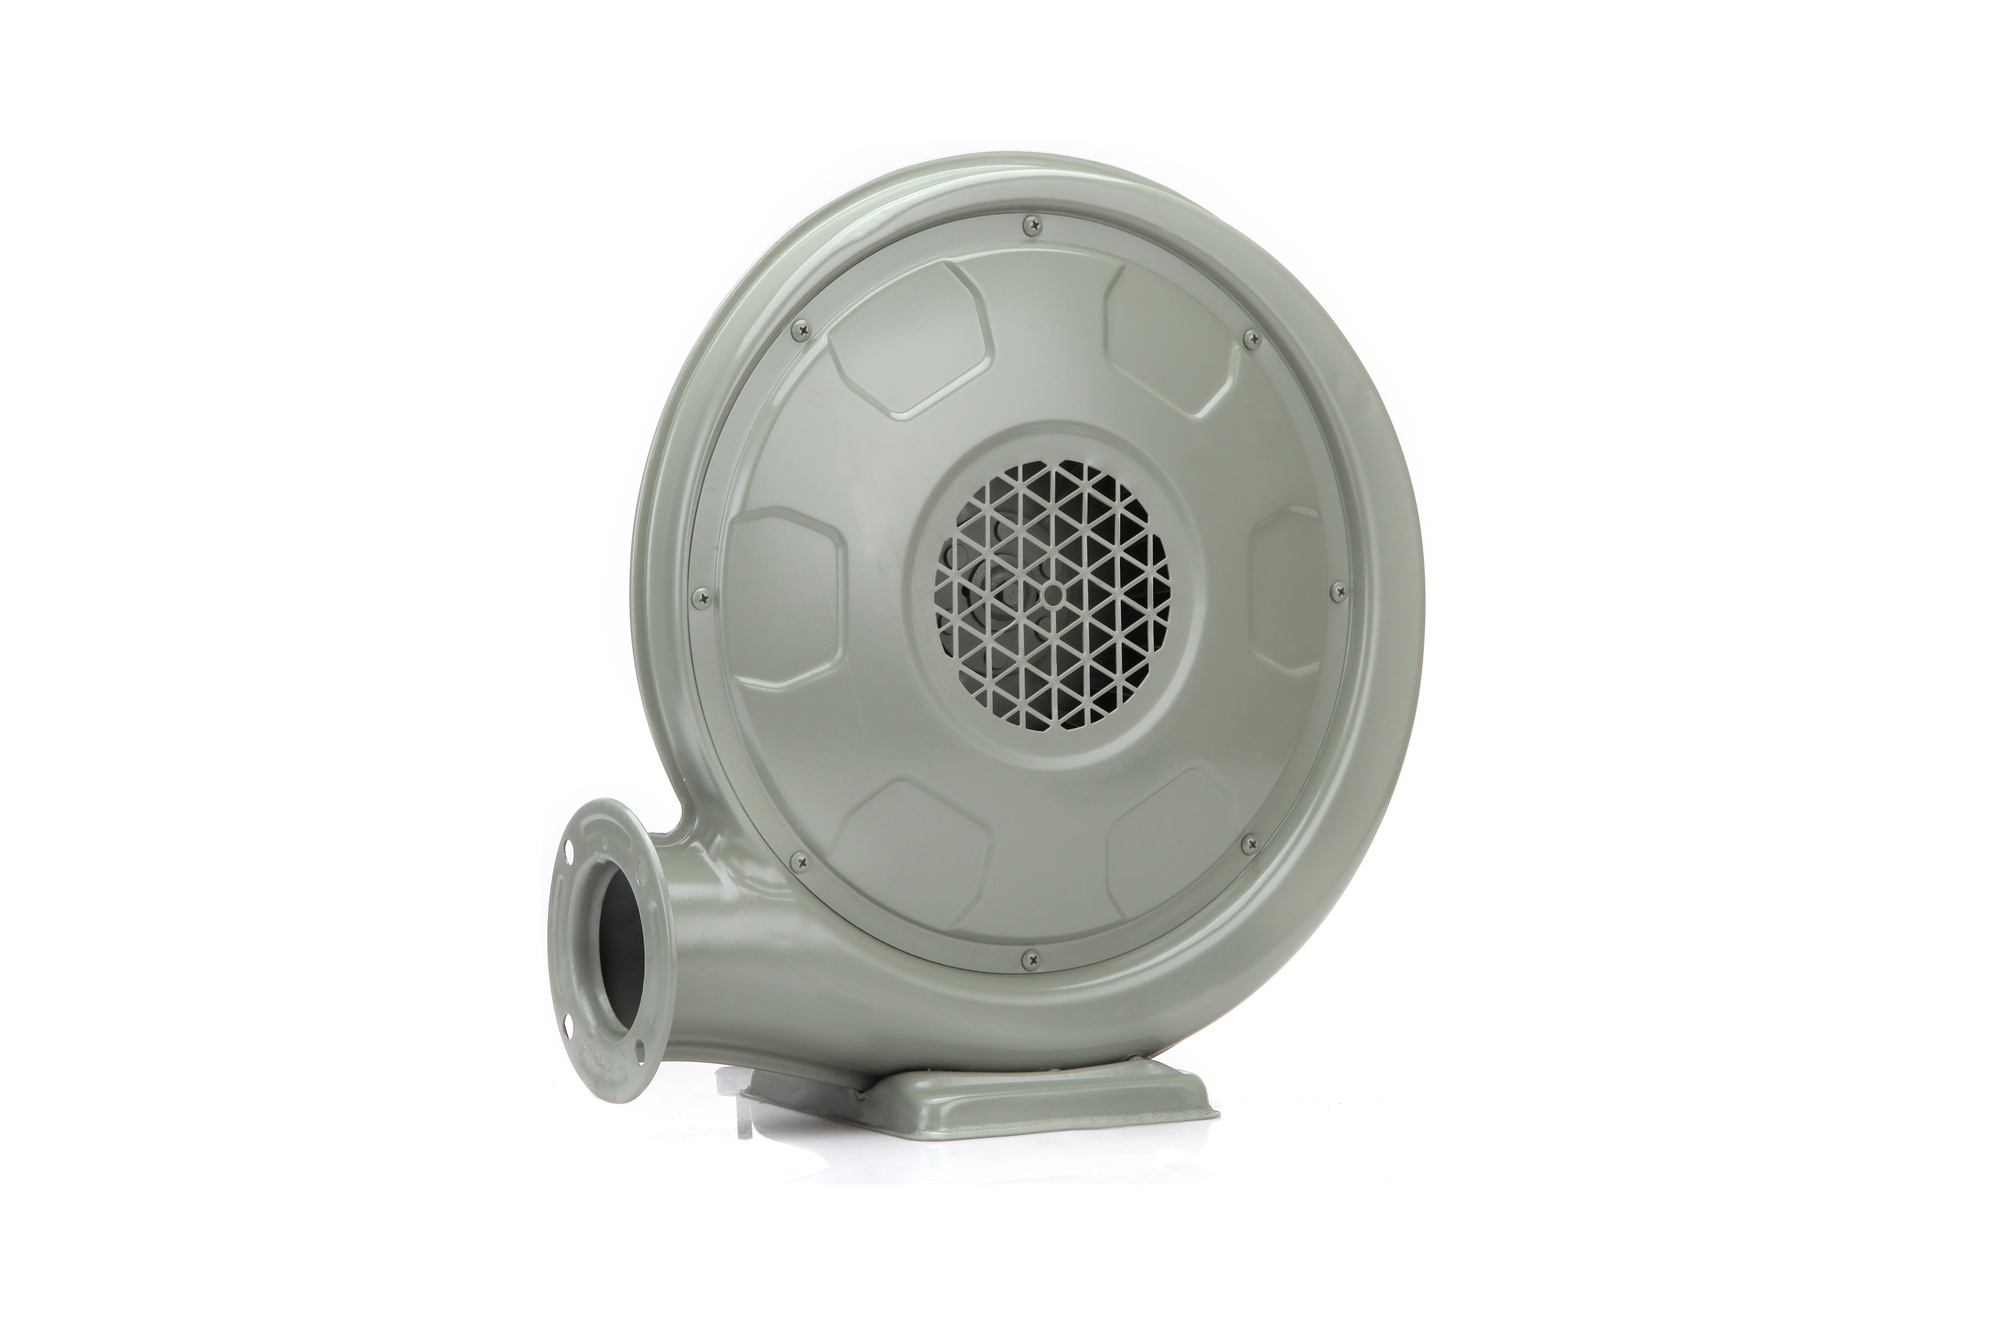 [Hot Item] 250W 370W Medium Pressure Centrifugal Blower/Fan for Kitchen  Exhaust